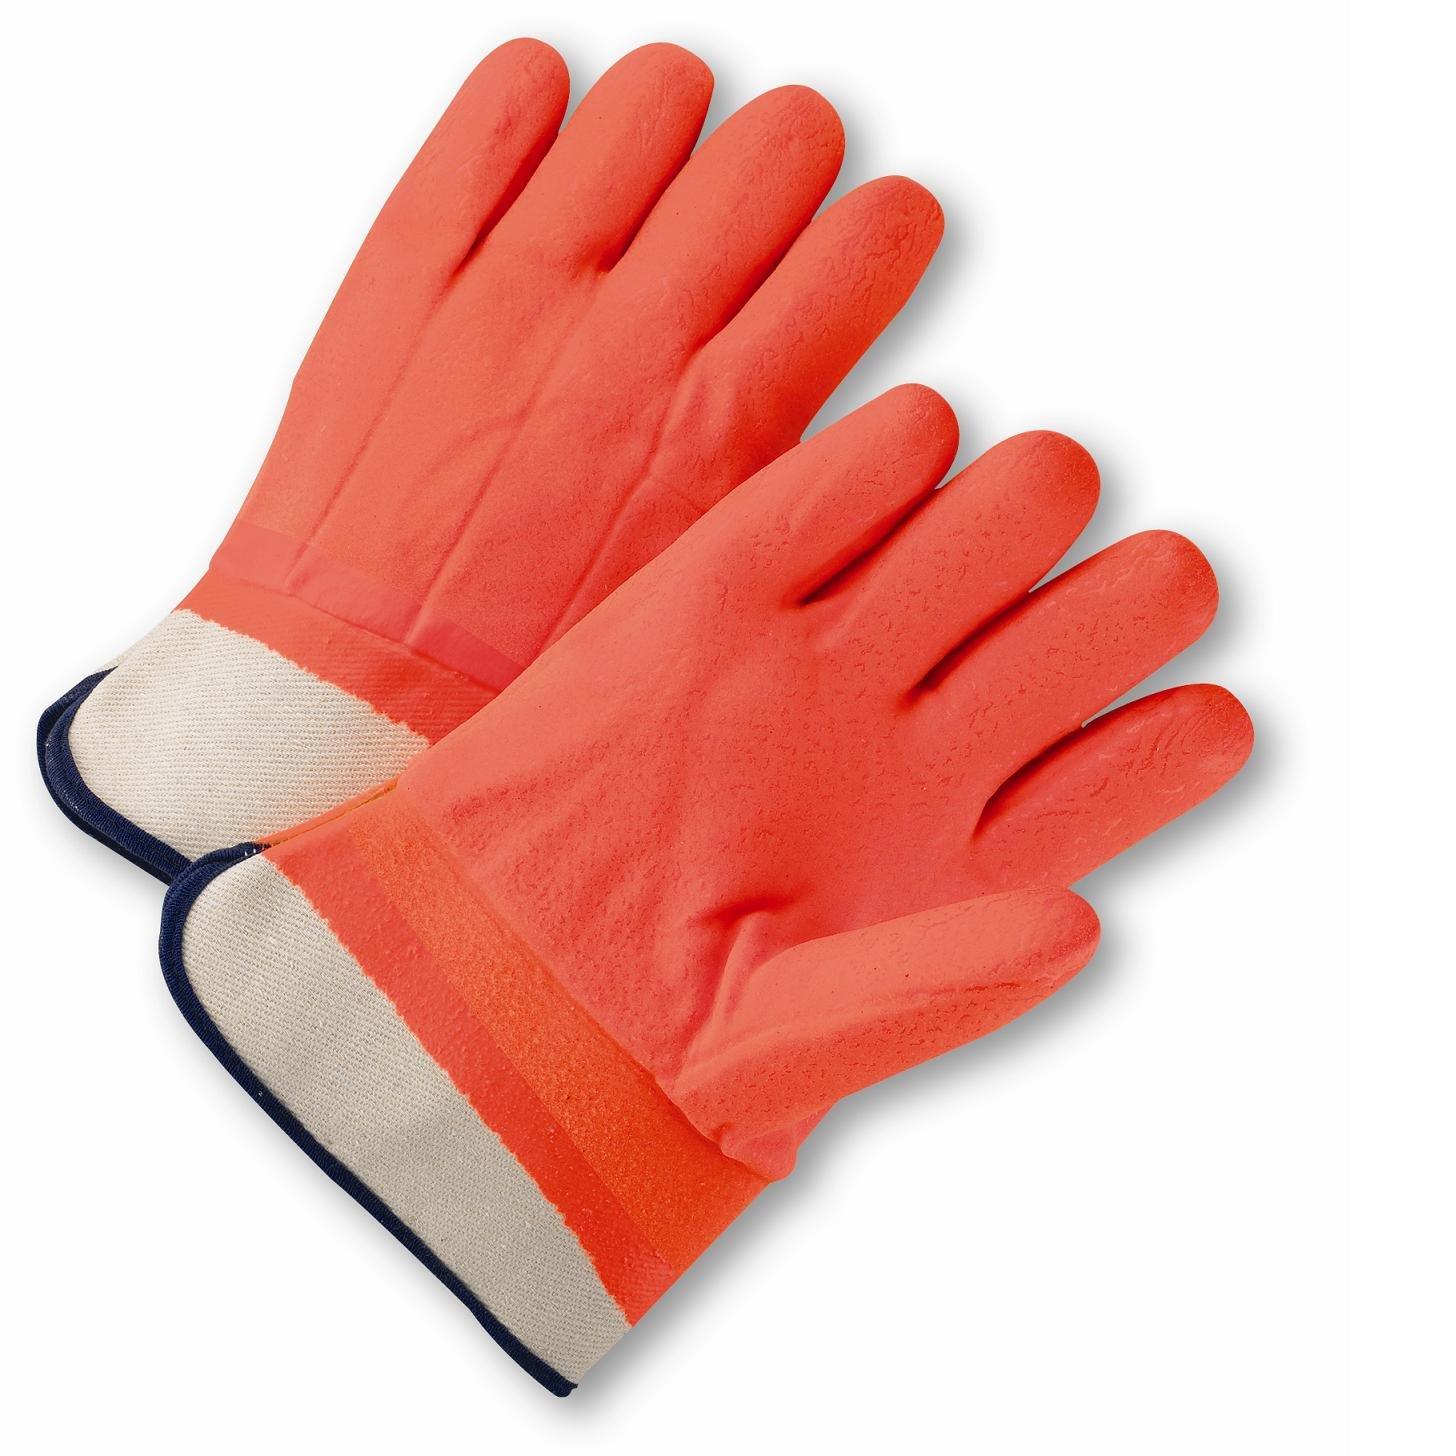 West Chester 1017ORF Safety Orange PVC Coated Gloves, Large